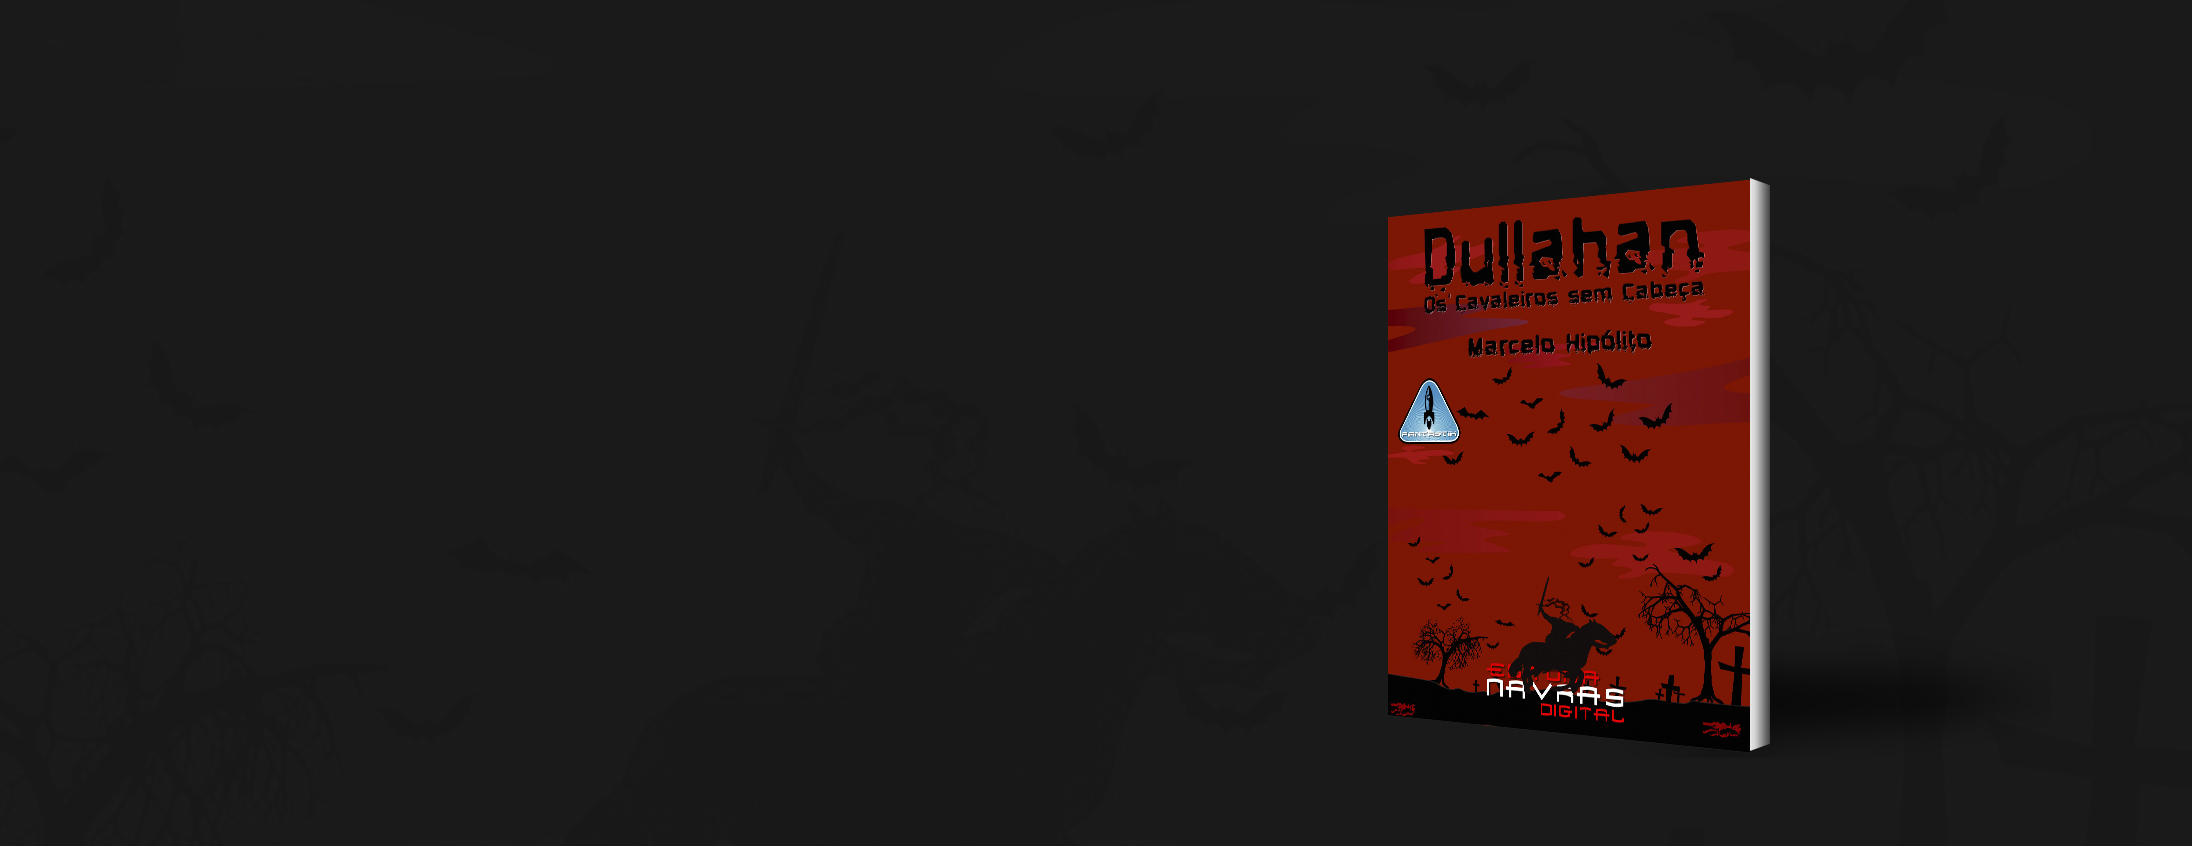 Dullahan - Os Cavaleiros sem Cabeça